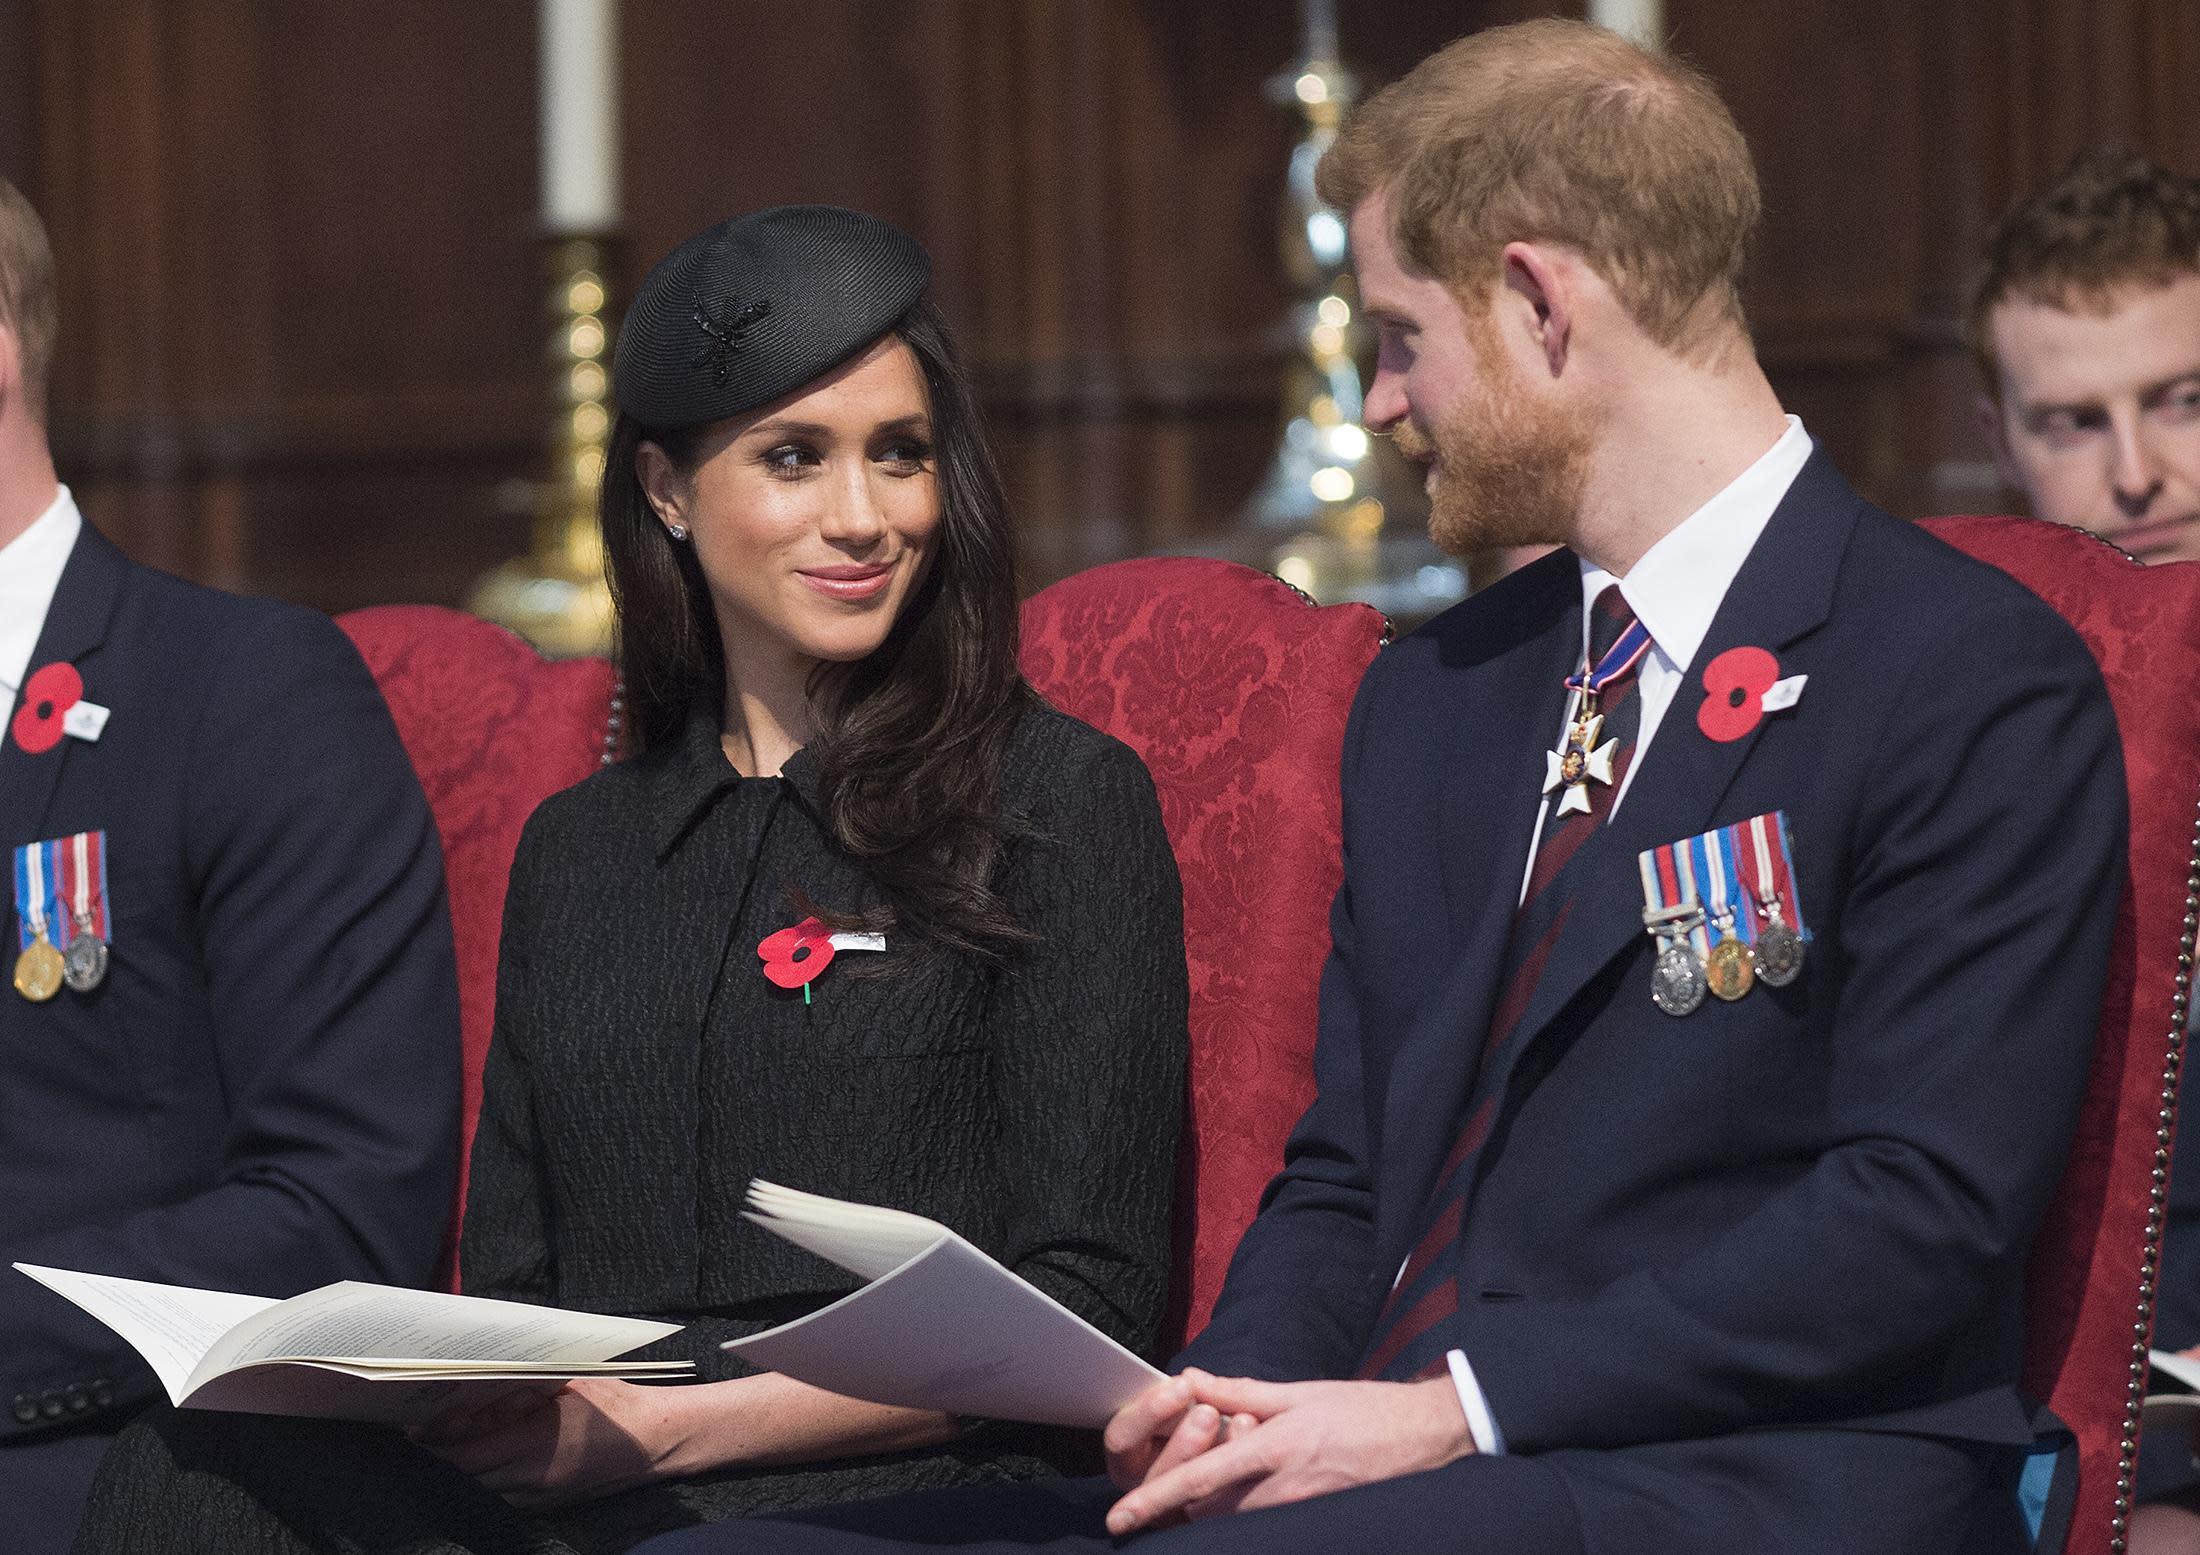 Royal Wedding 2018 Date.Royal Wedding 2018 Date Prince Harry And Meghan Markle Getting